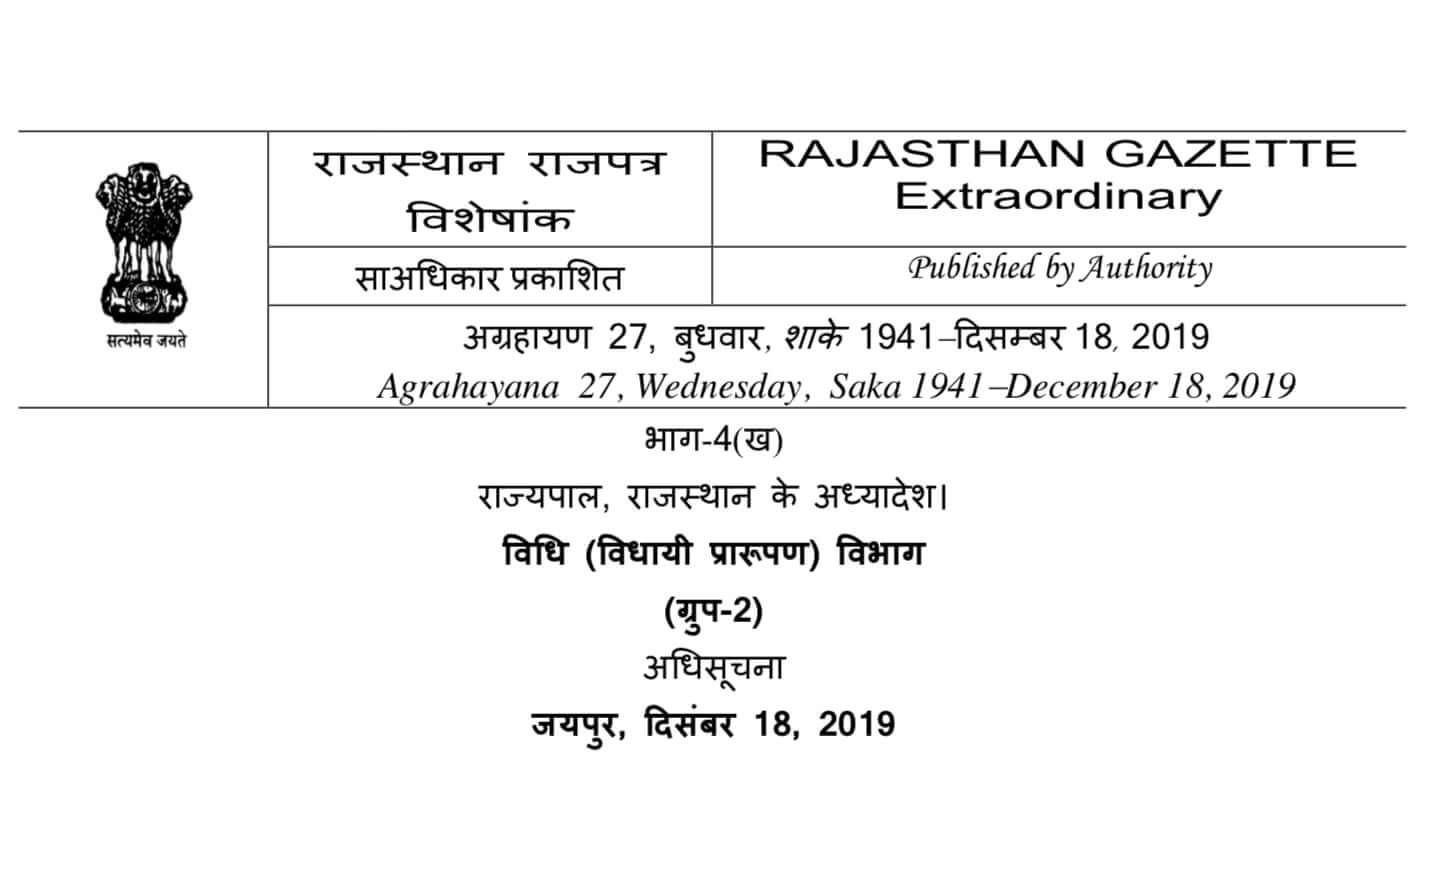 राजस्थान जन आधार प्राधिकरण अध्यादेश, 2019